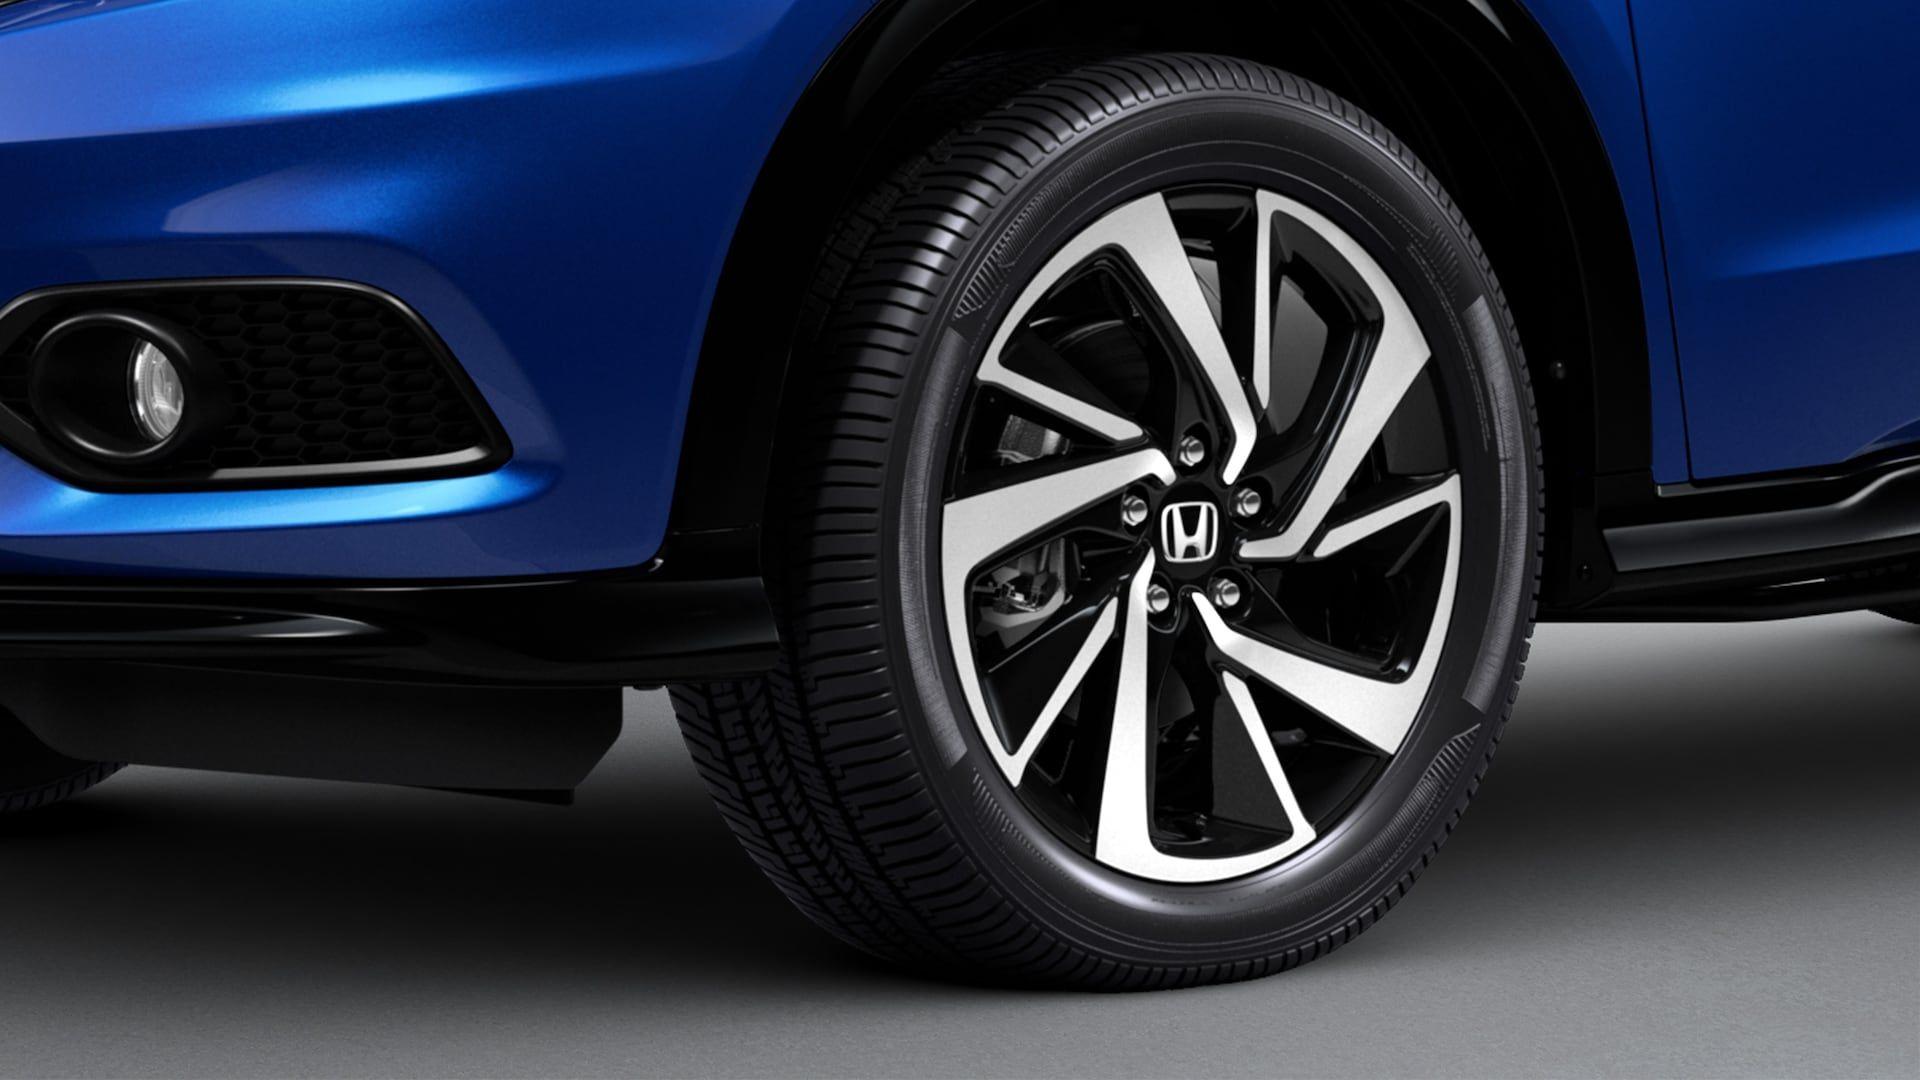 2020 Honda HR-V Wheel